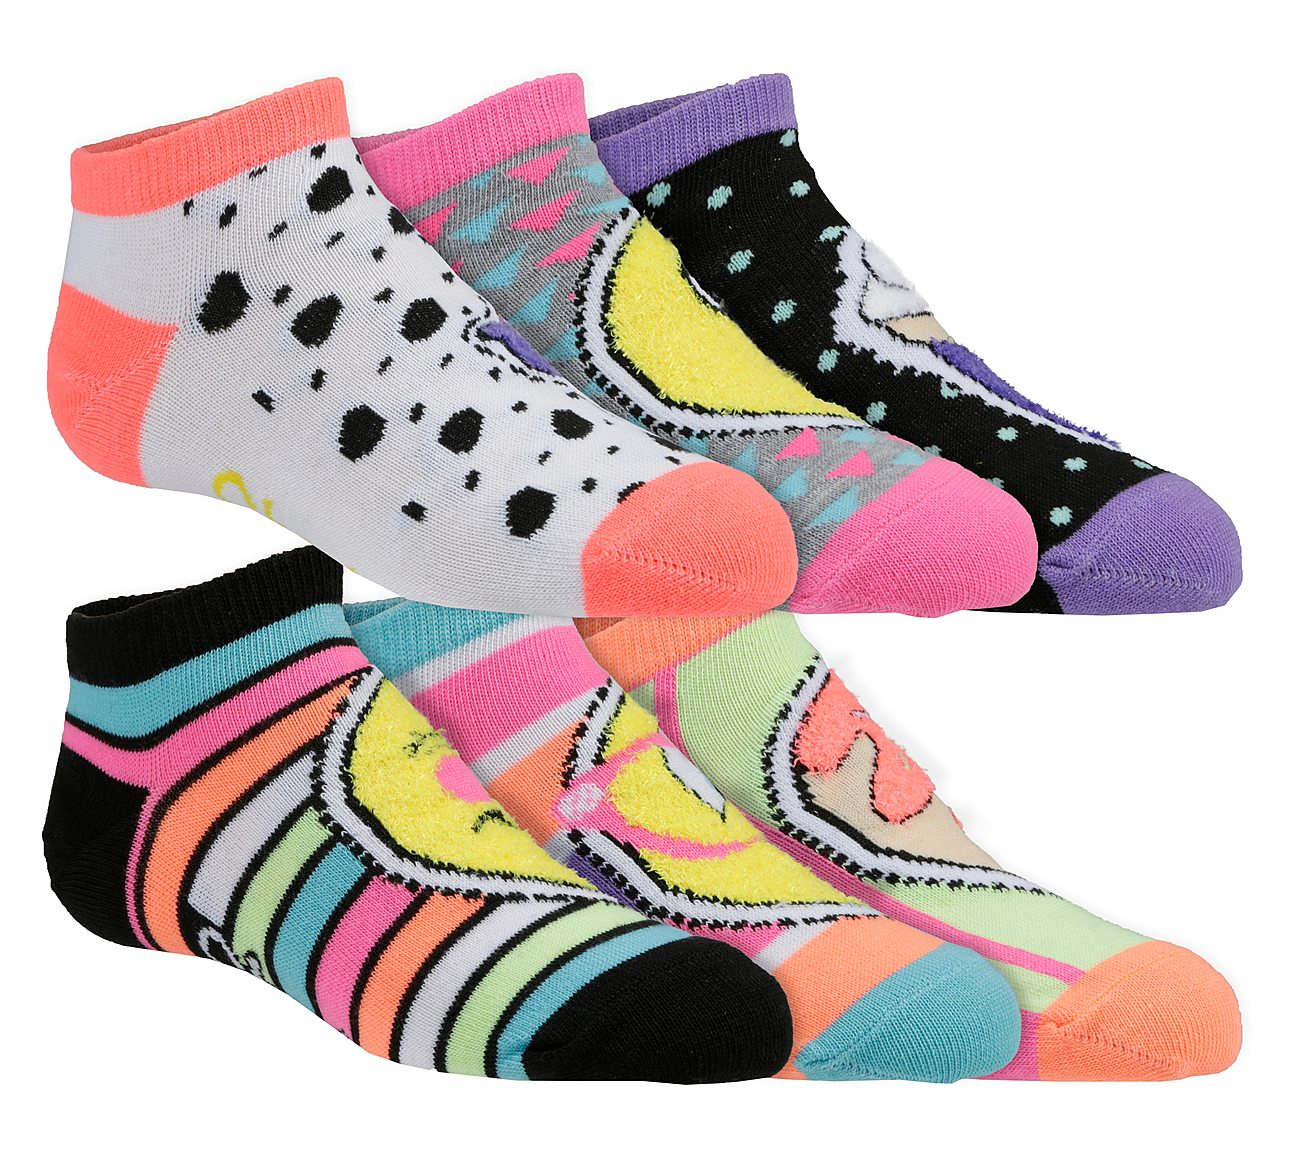 6 Pack Low Cut Cozy Socks